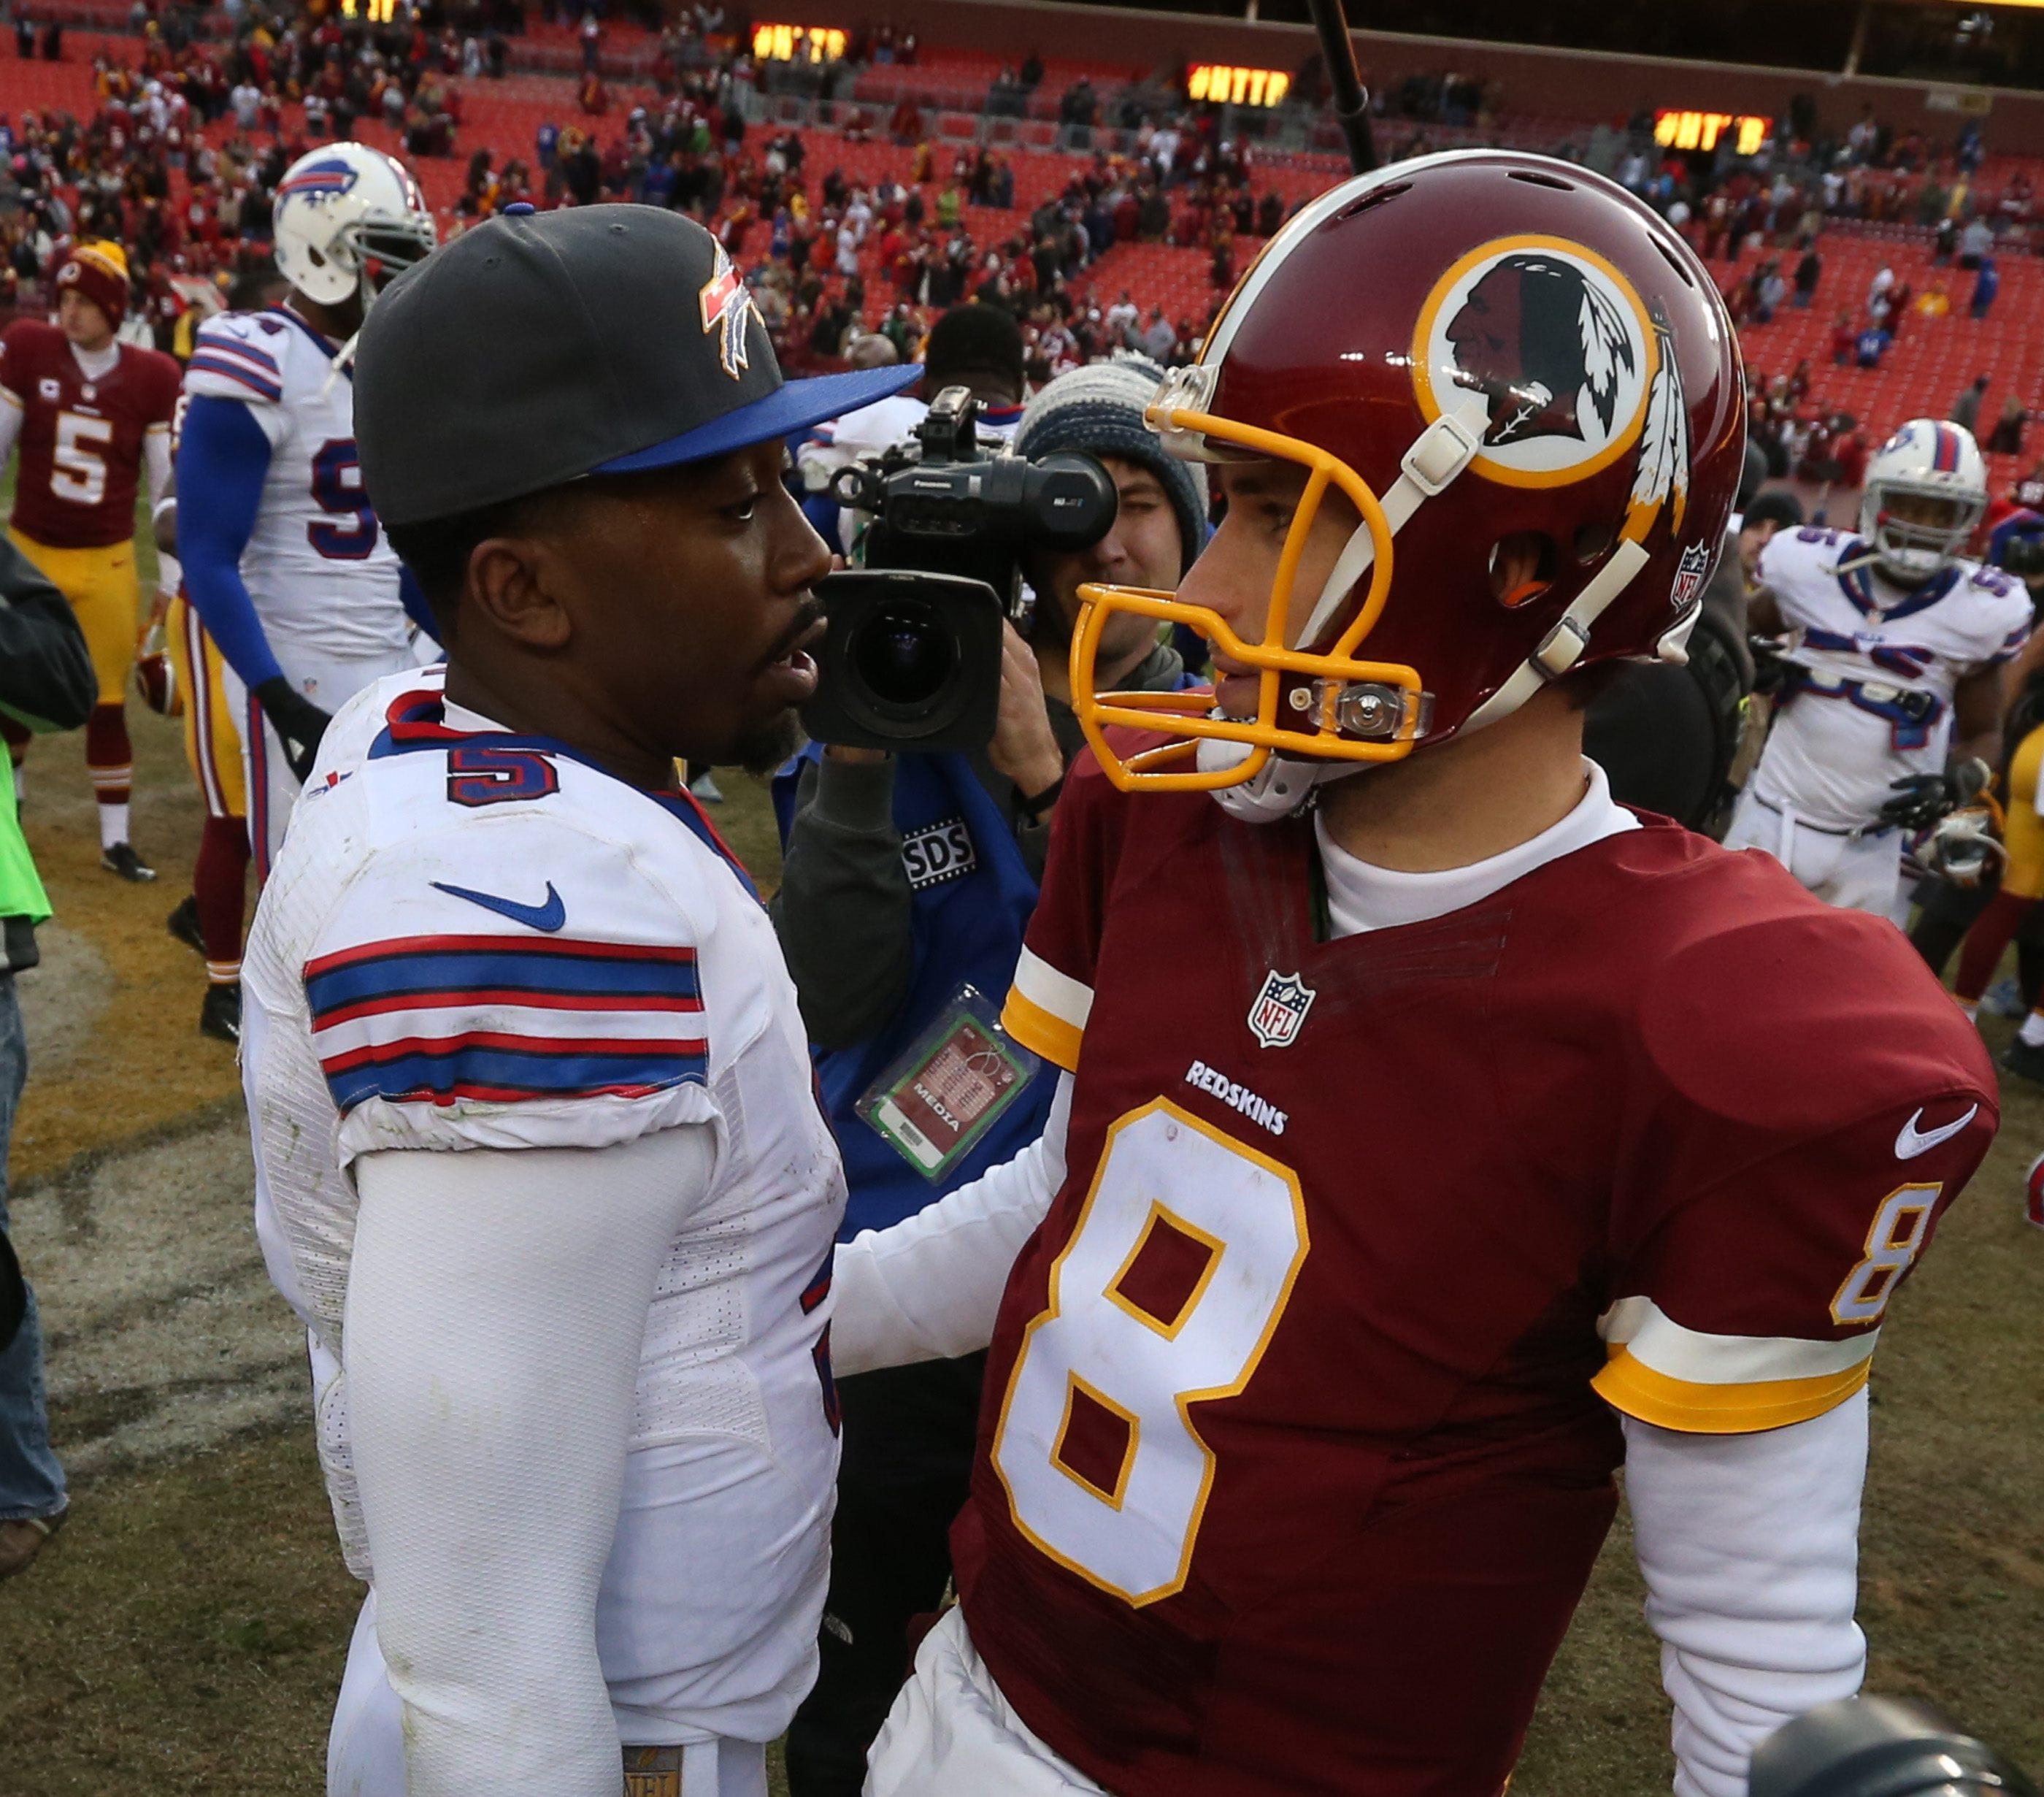 Buffalo Bills quarterback Tyrod Taylor (5) and Washington Redskins quarterback Kirk Cousins (8) shake hands after the game.  (James P. McCoy/ Buffalo News)